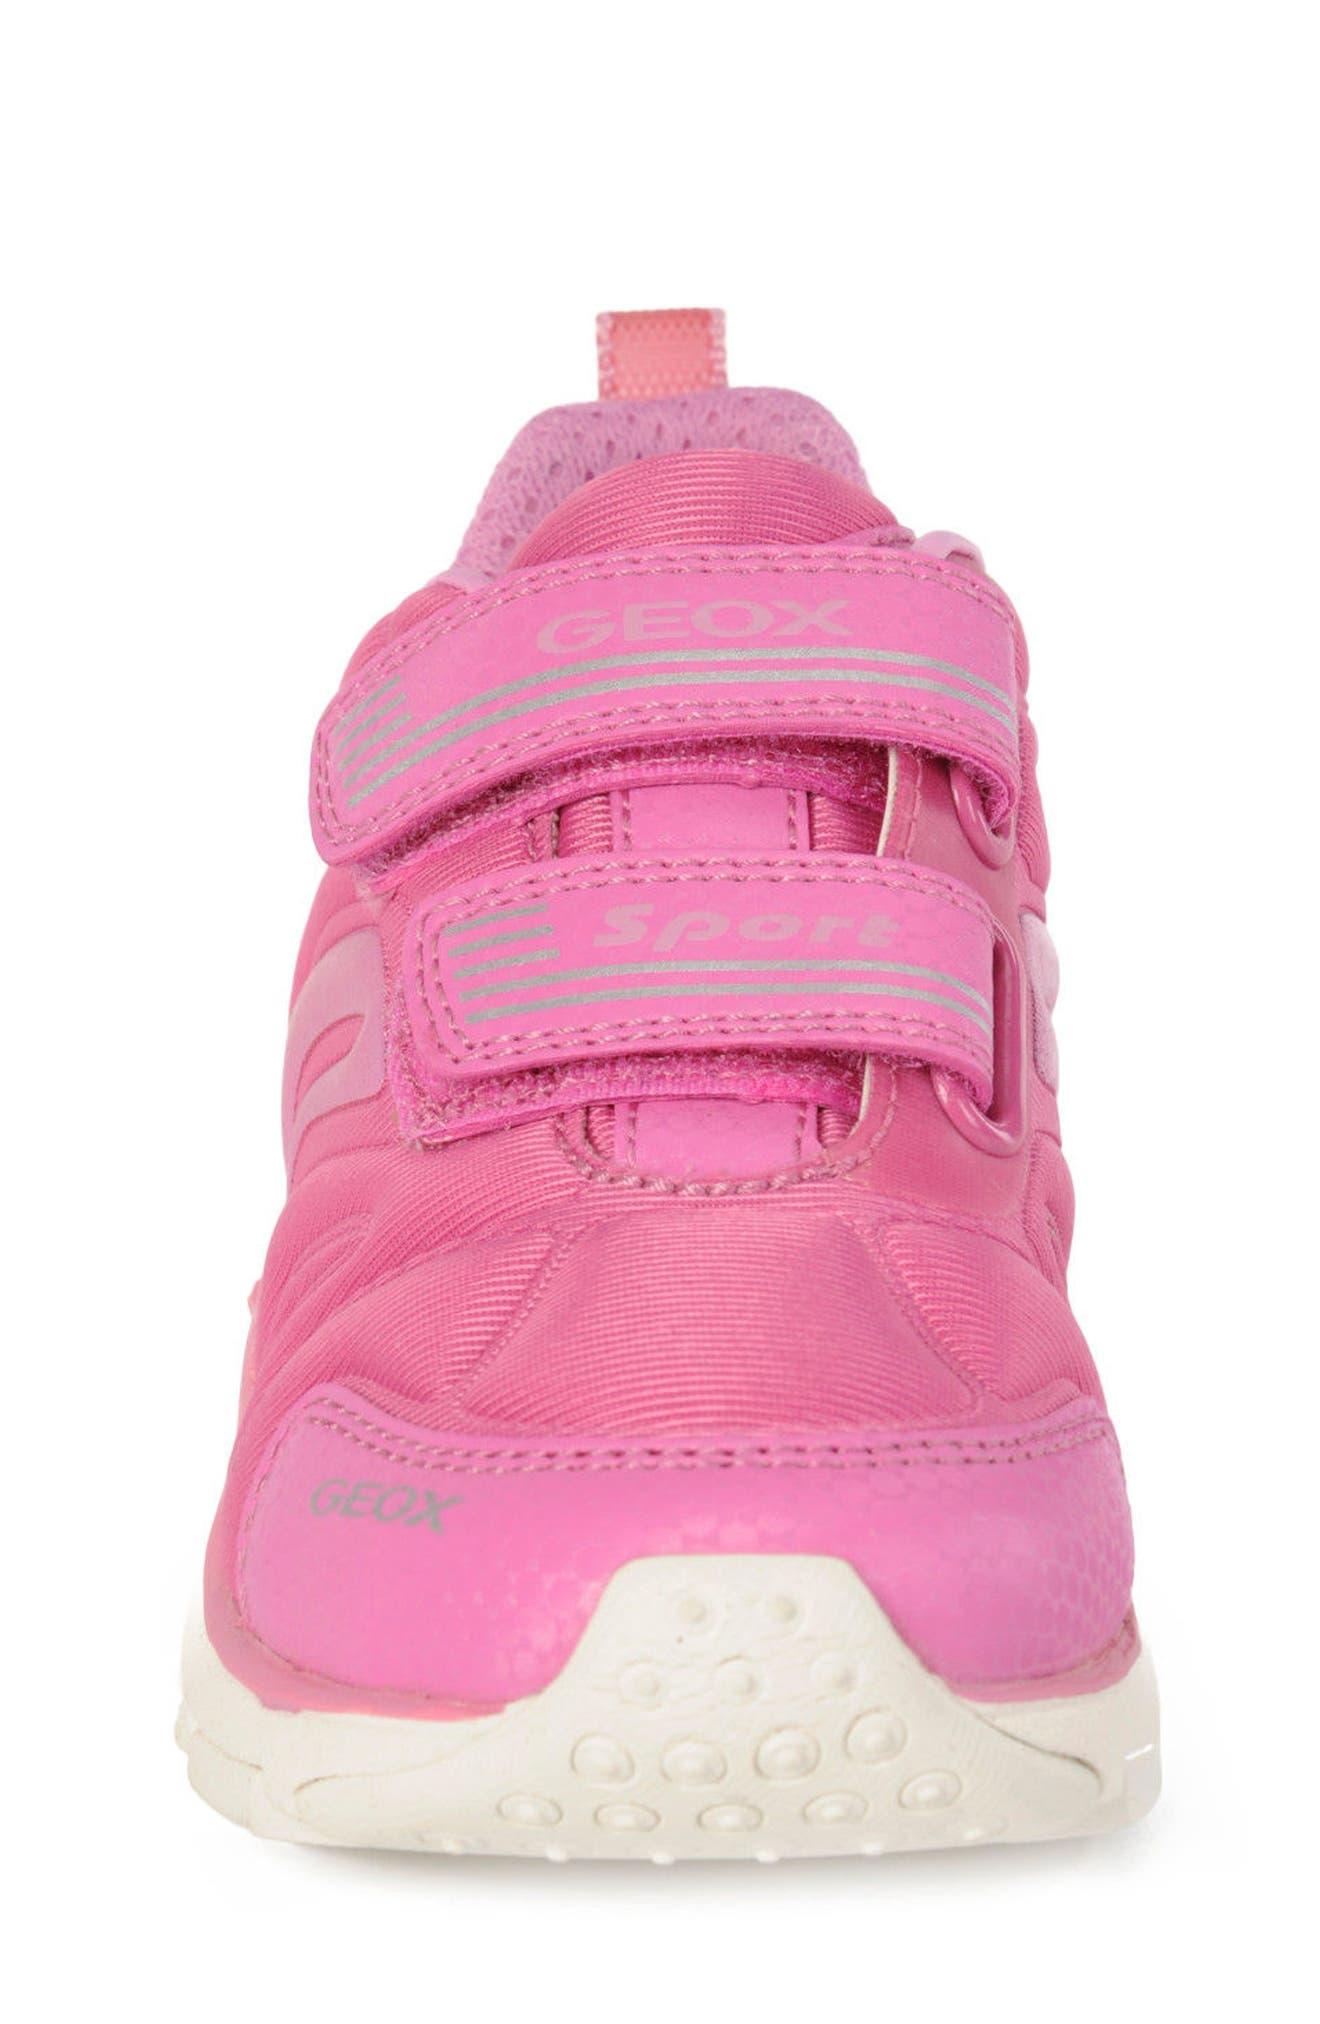 Torque Sneaker,                             Alternate thumbnail 4, color,                             660